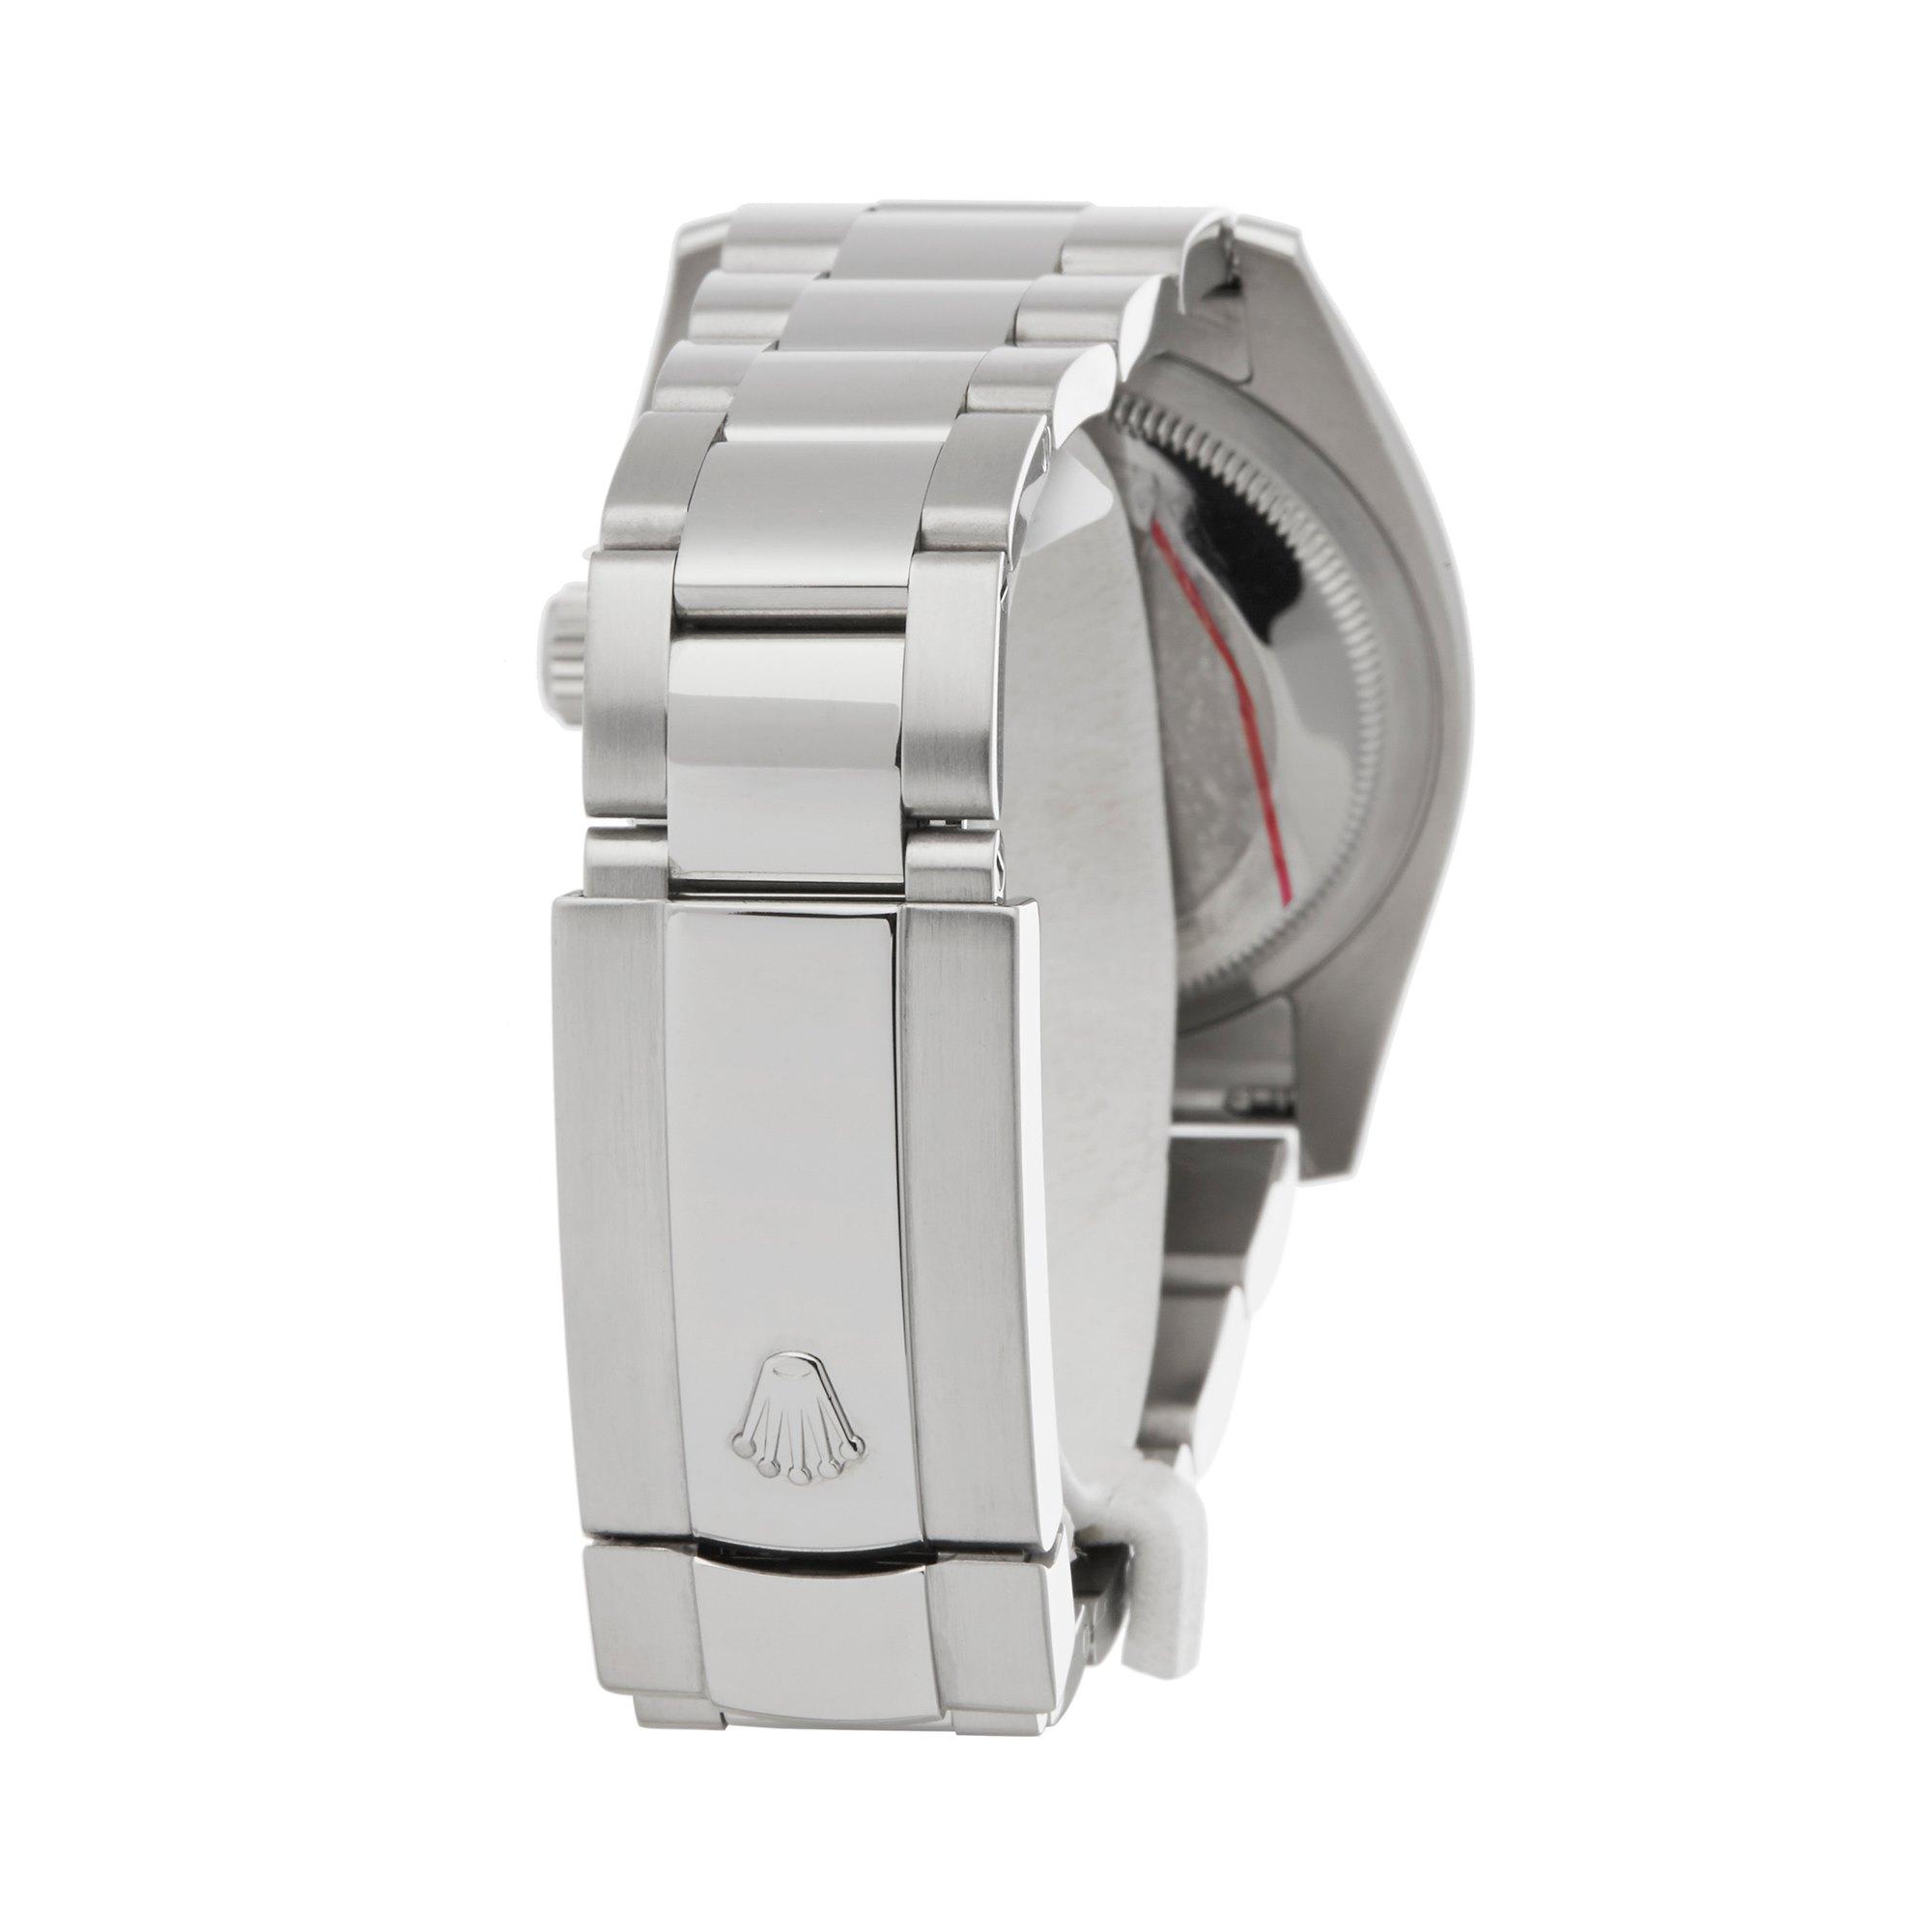 Rolex Datejust 36 Stainless Steel 116234